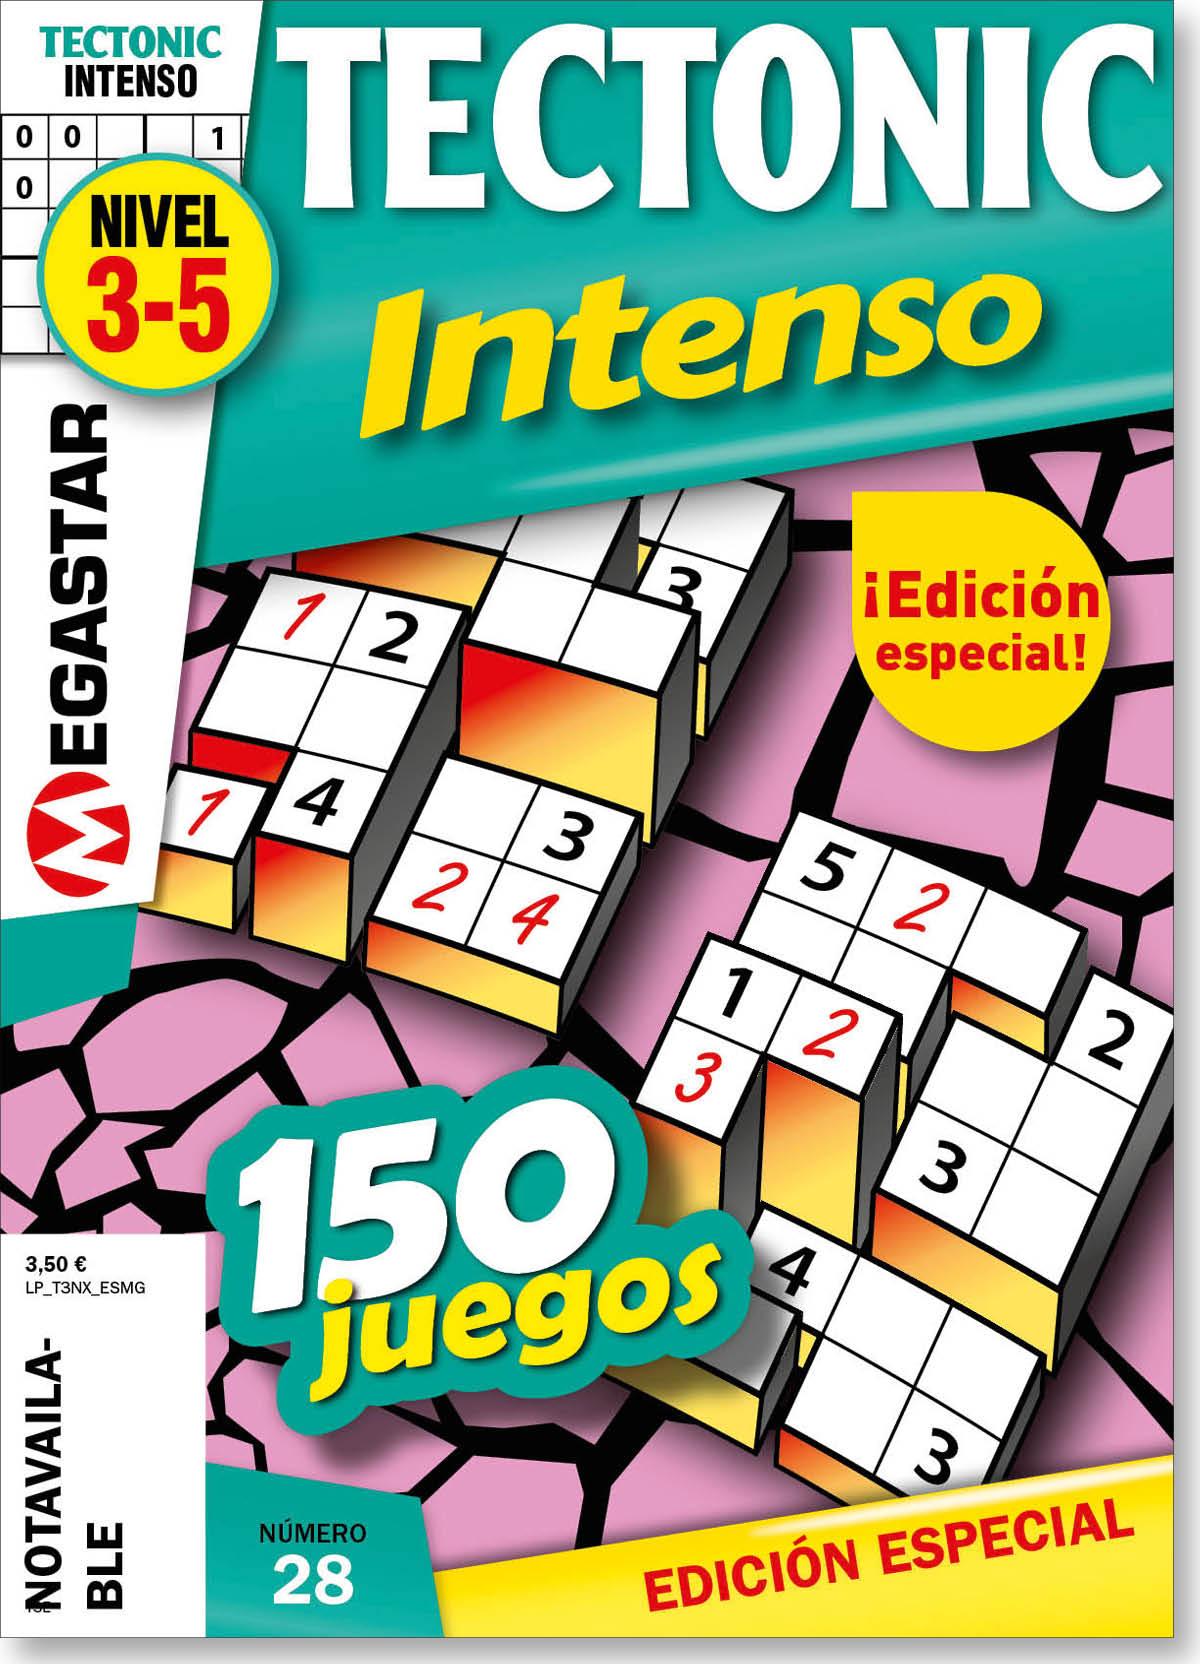 TECTONIC INTENSO NIVEL 3-5